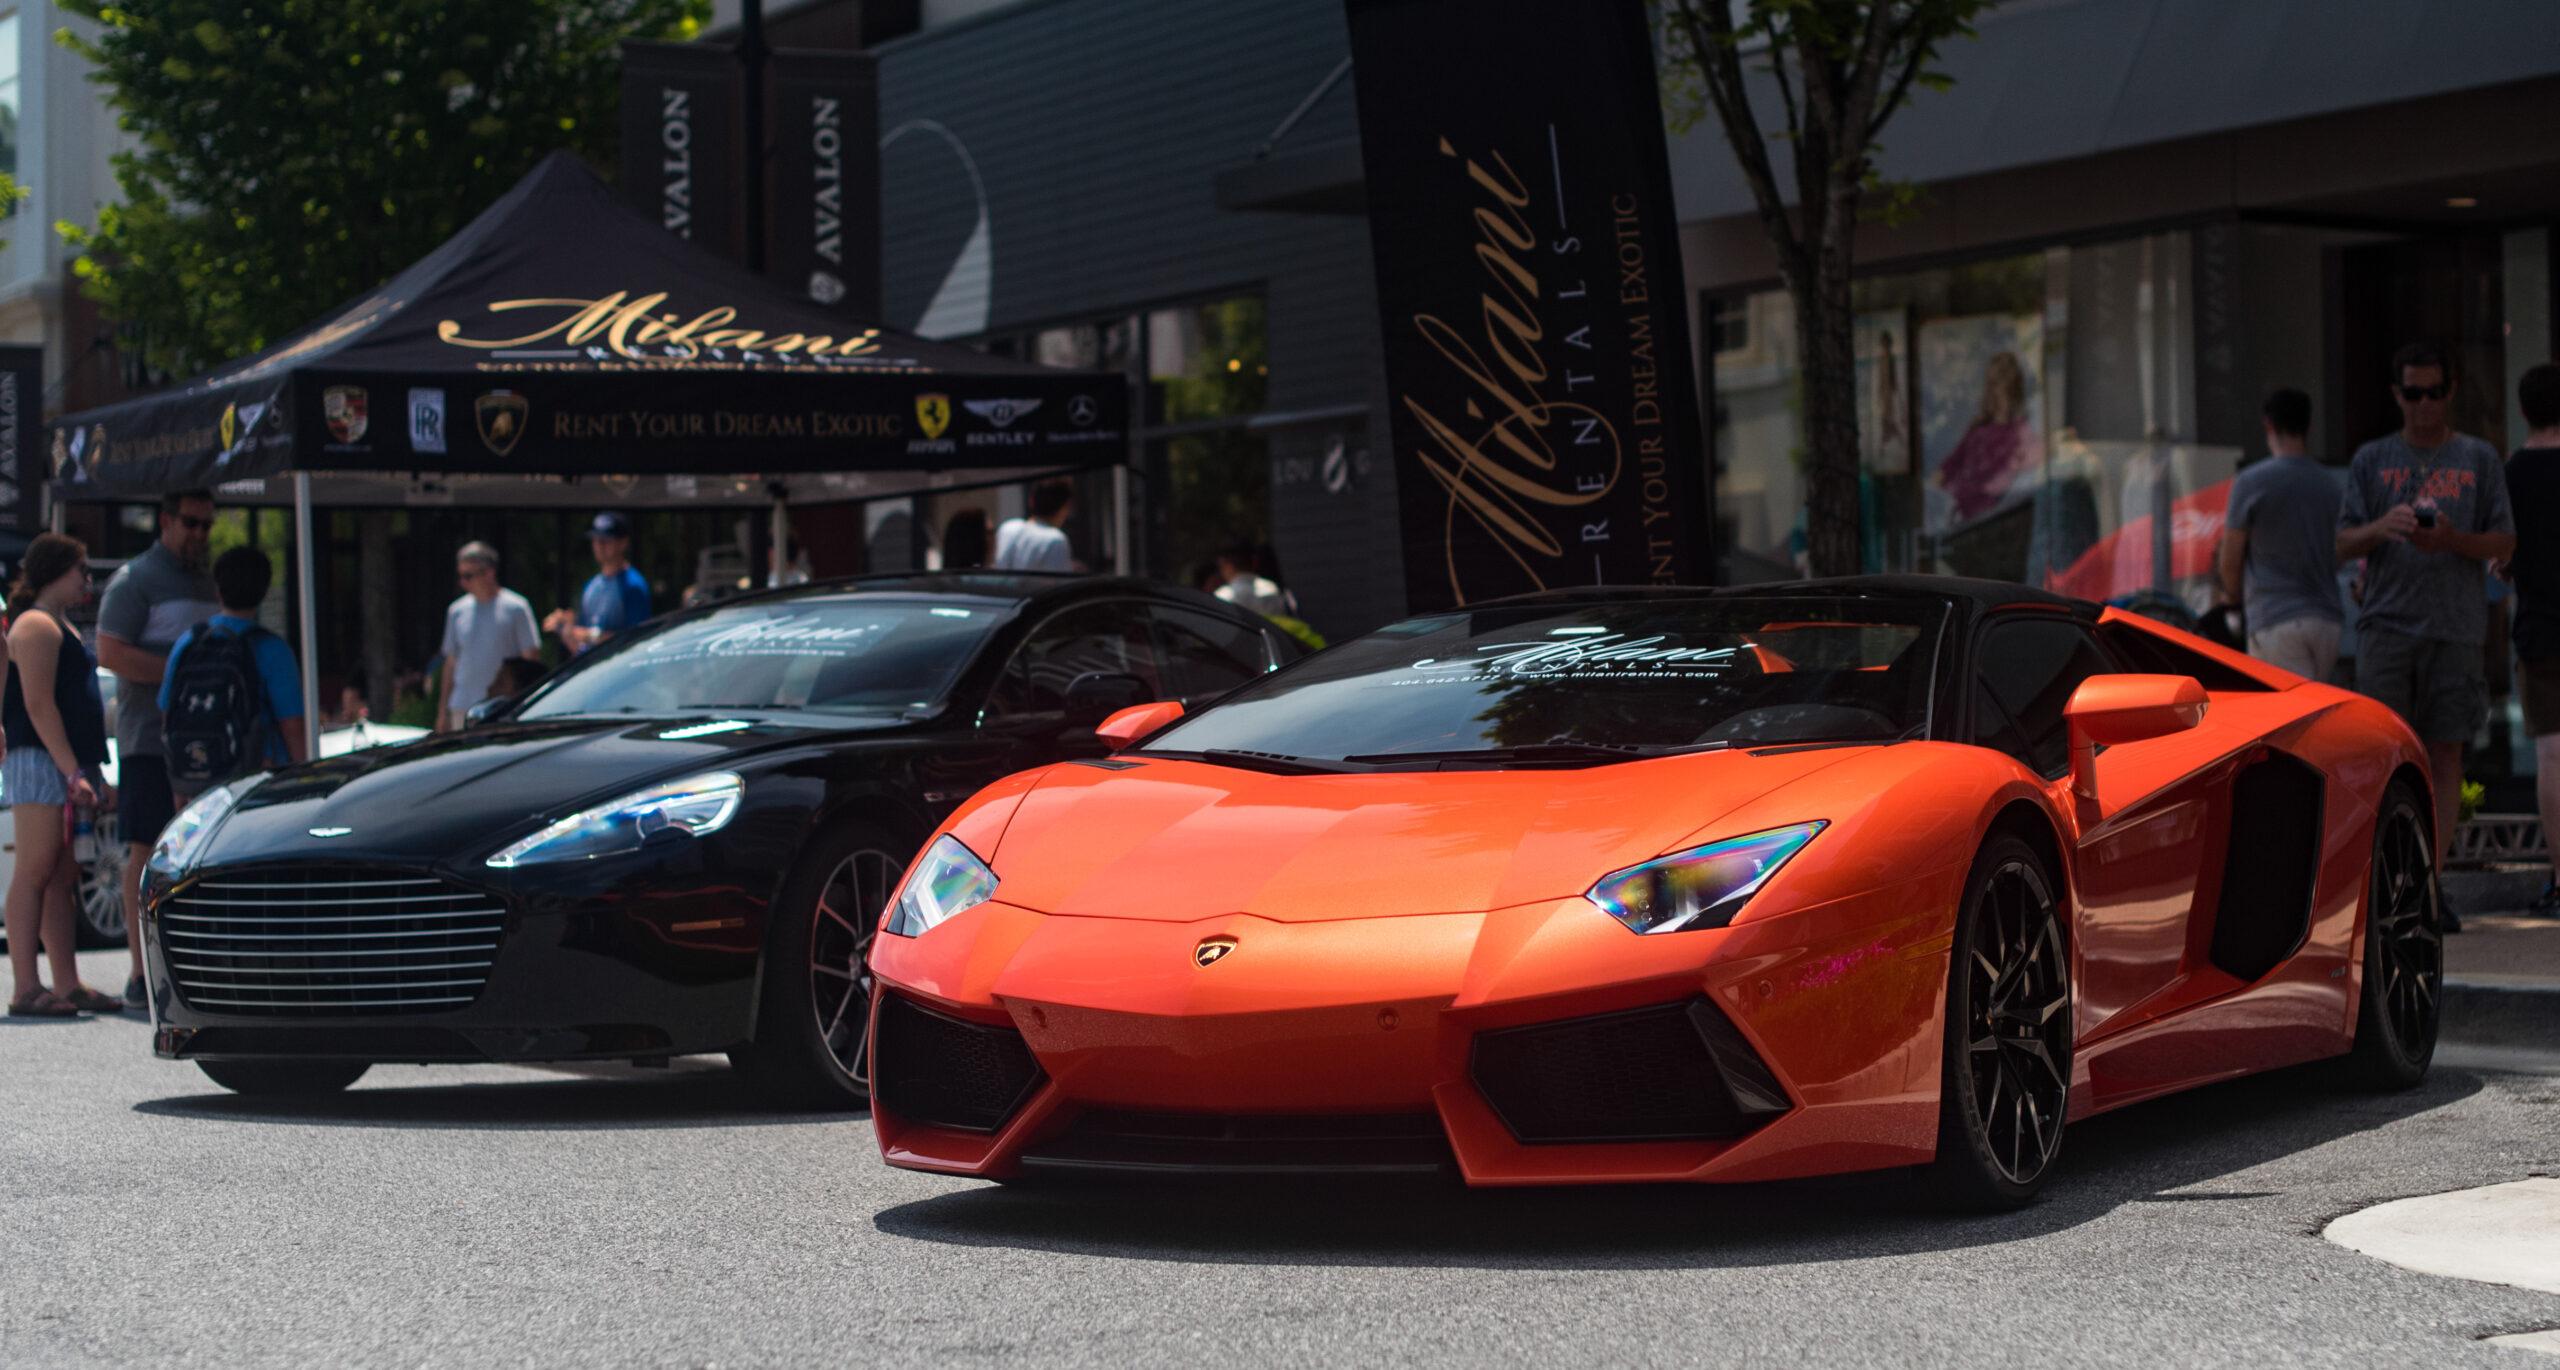 Lamborghini and Aston Martin_Exotic Cars